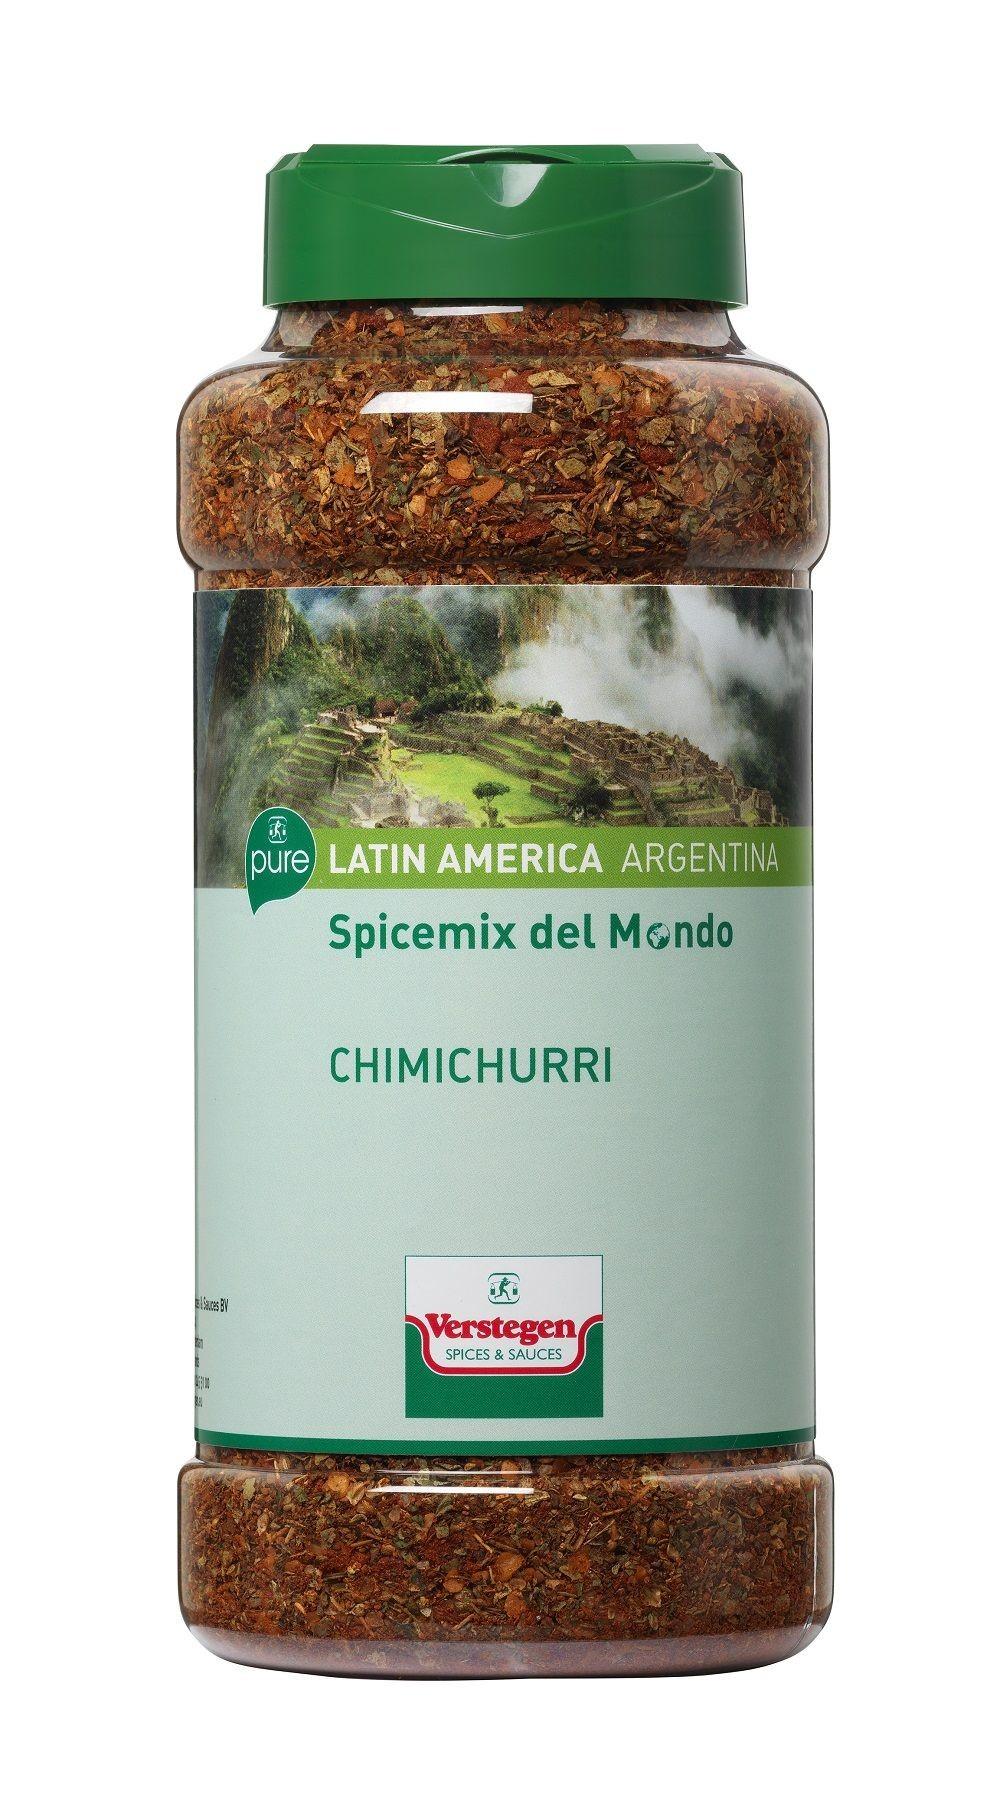 Verstegen Spicemix del Mondo chimichurri 500gr 1LP